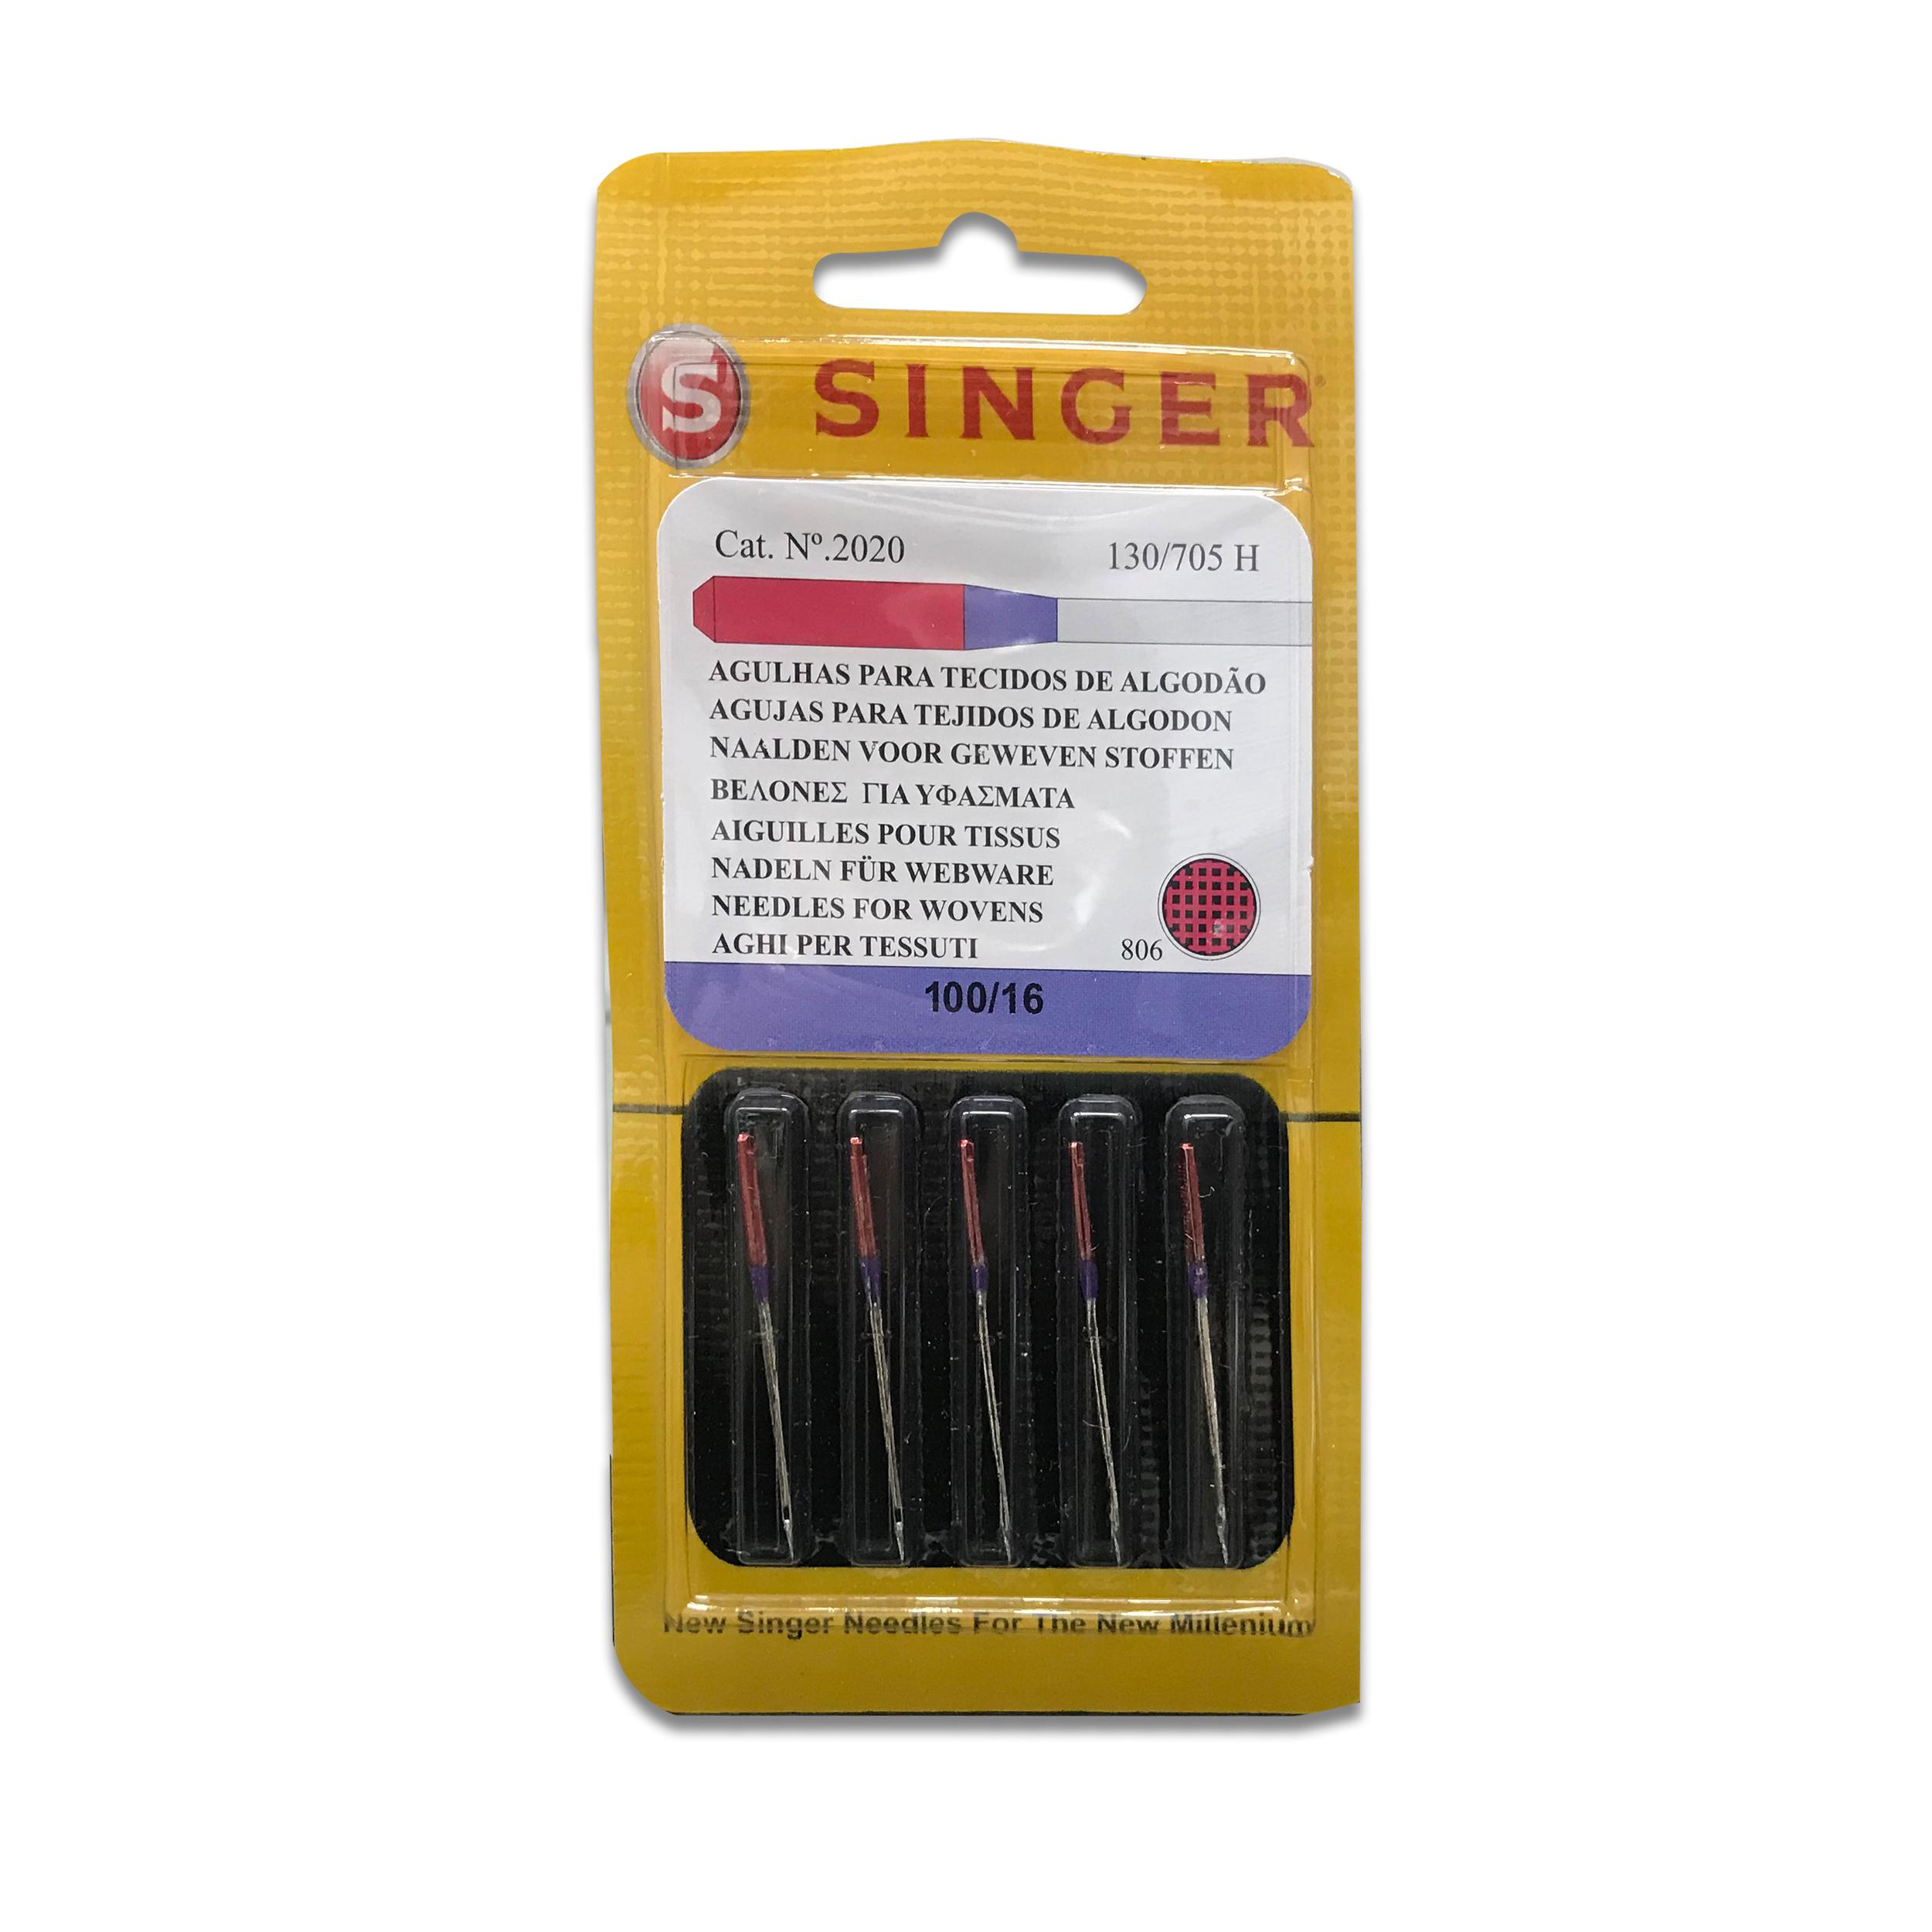 Aghi Singer per Tessuti di Cotone 2020 100/16